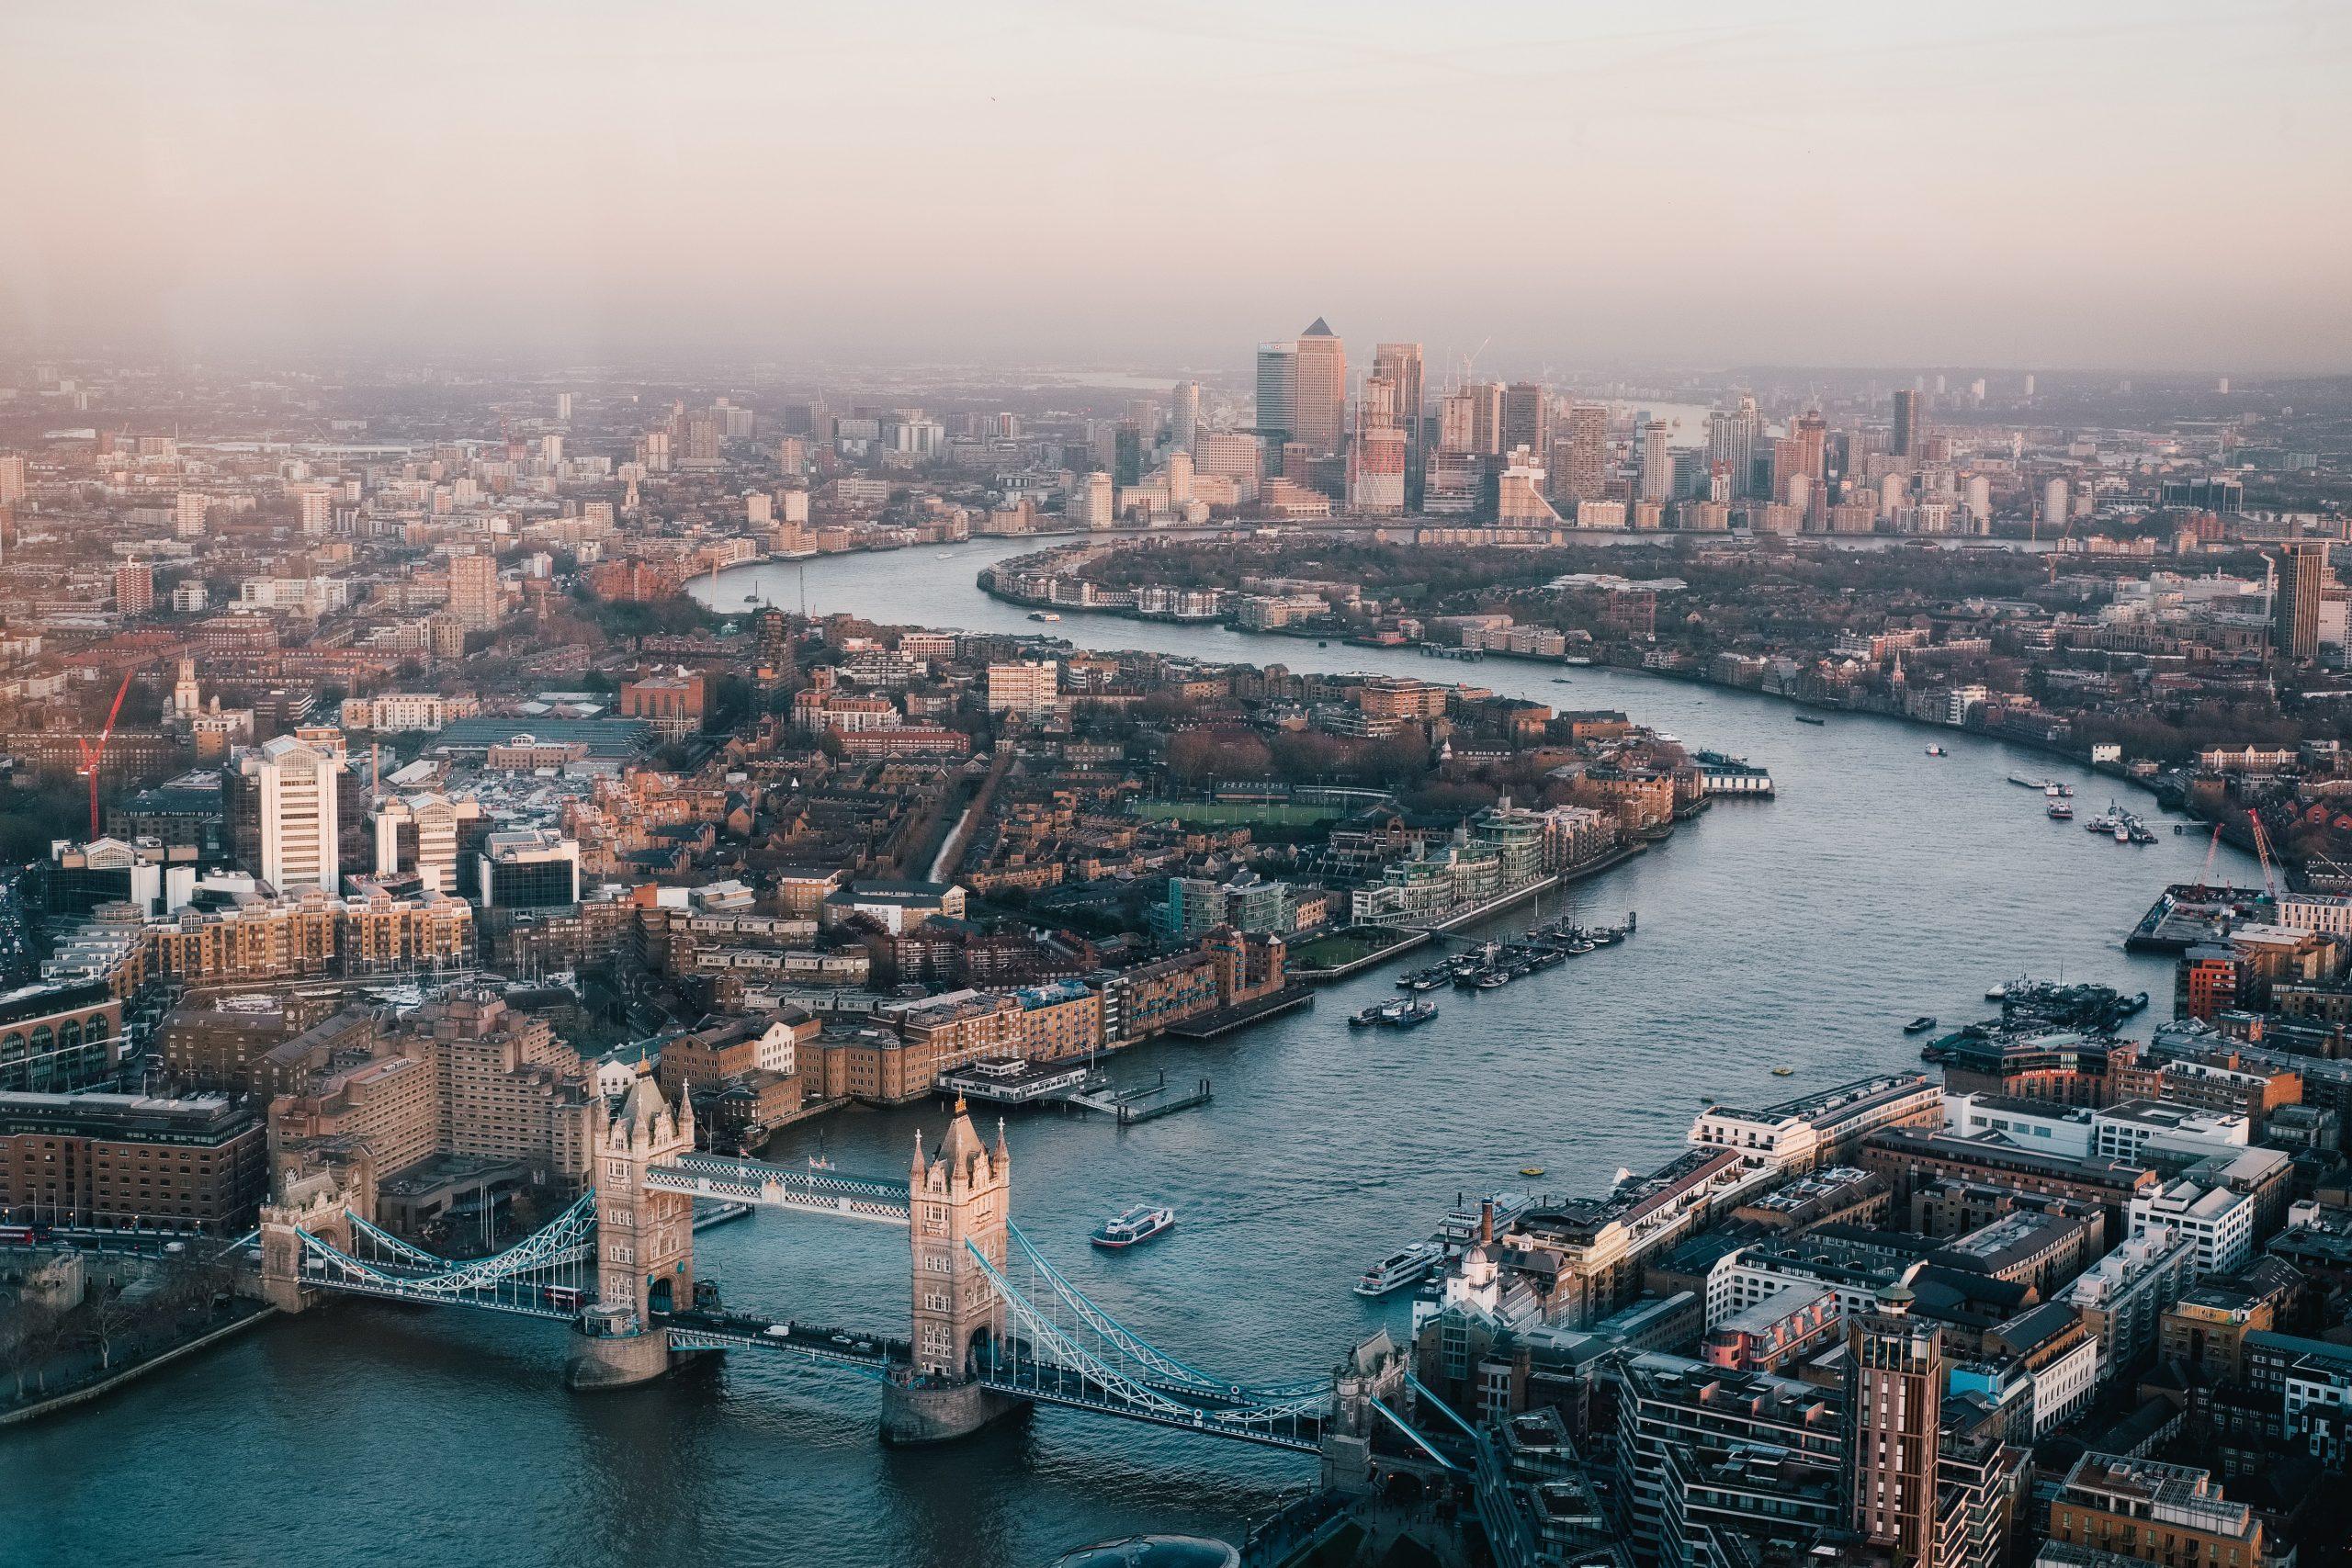 Digital accountant in London